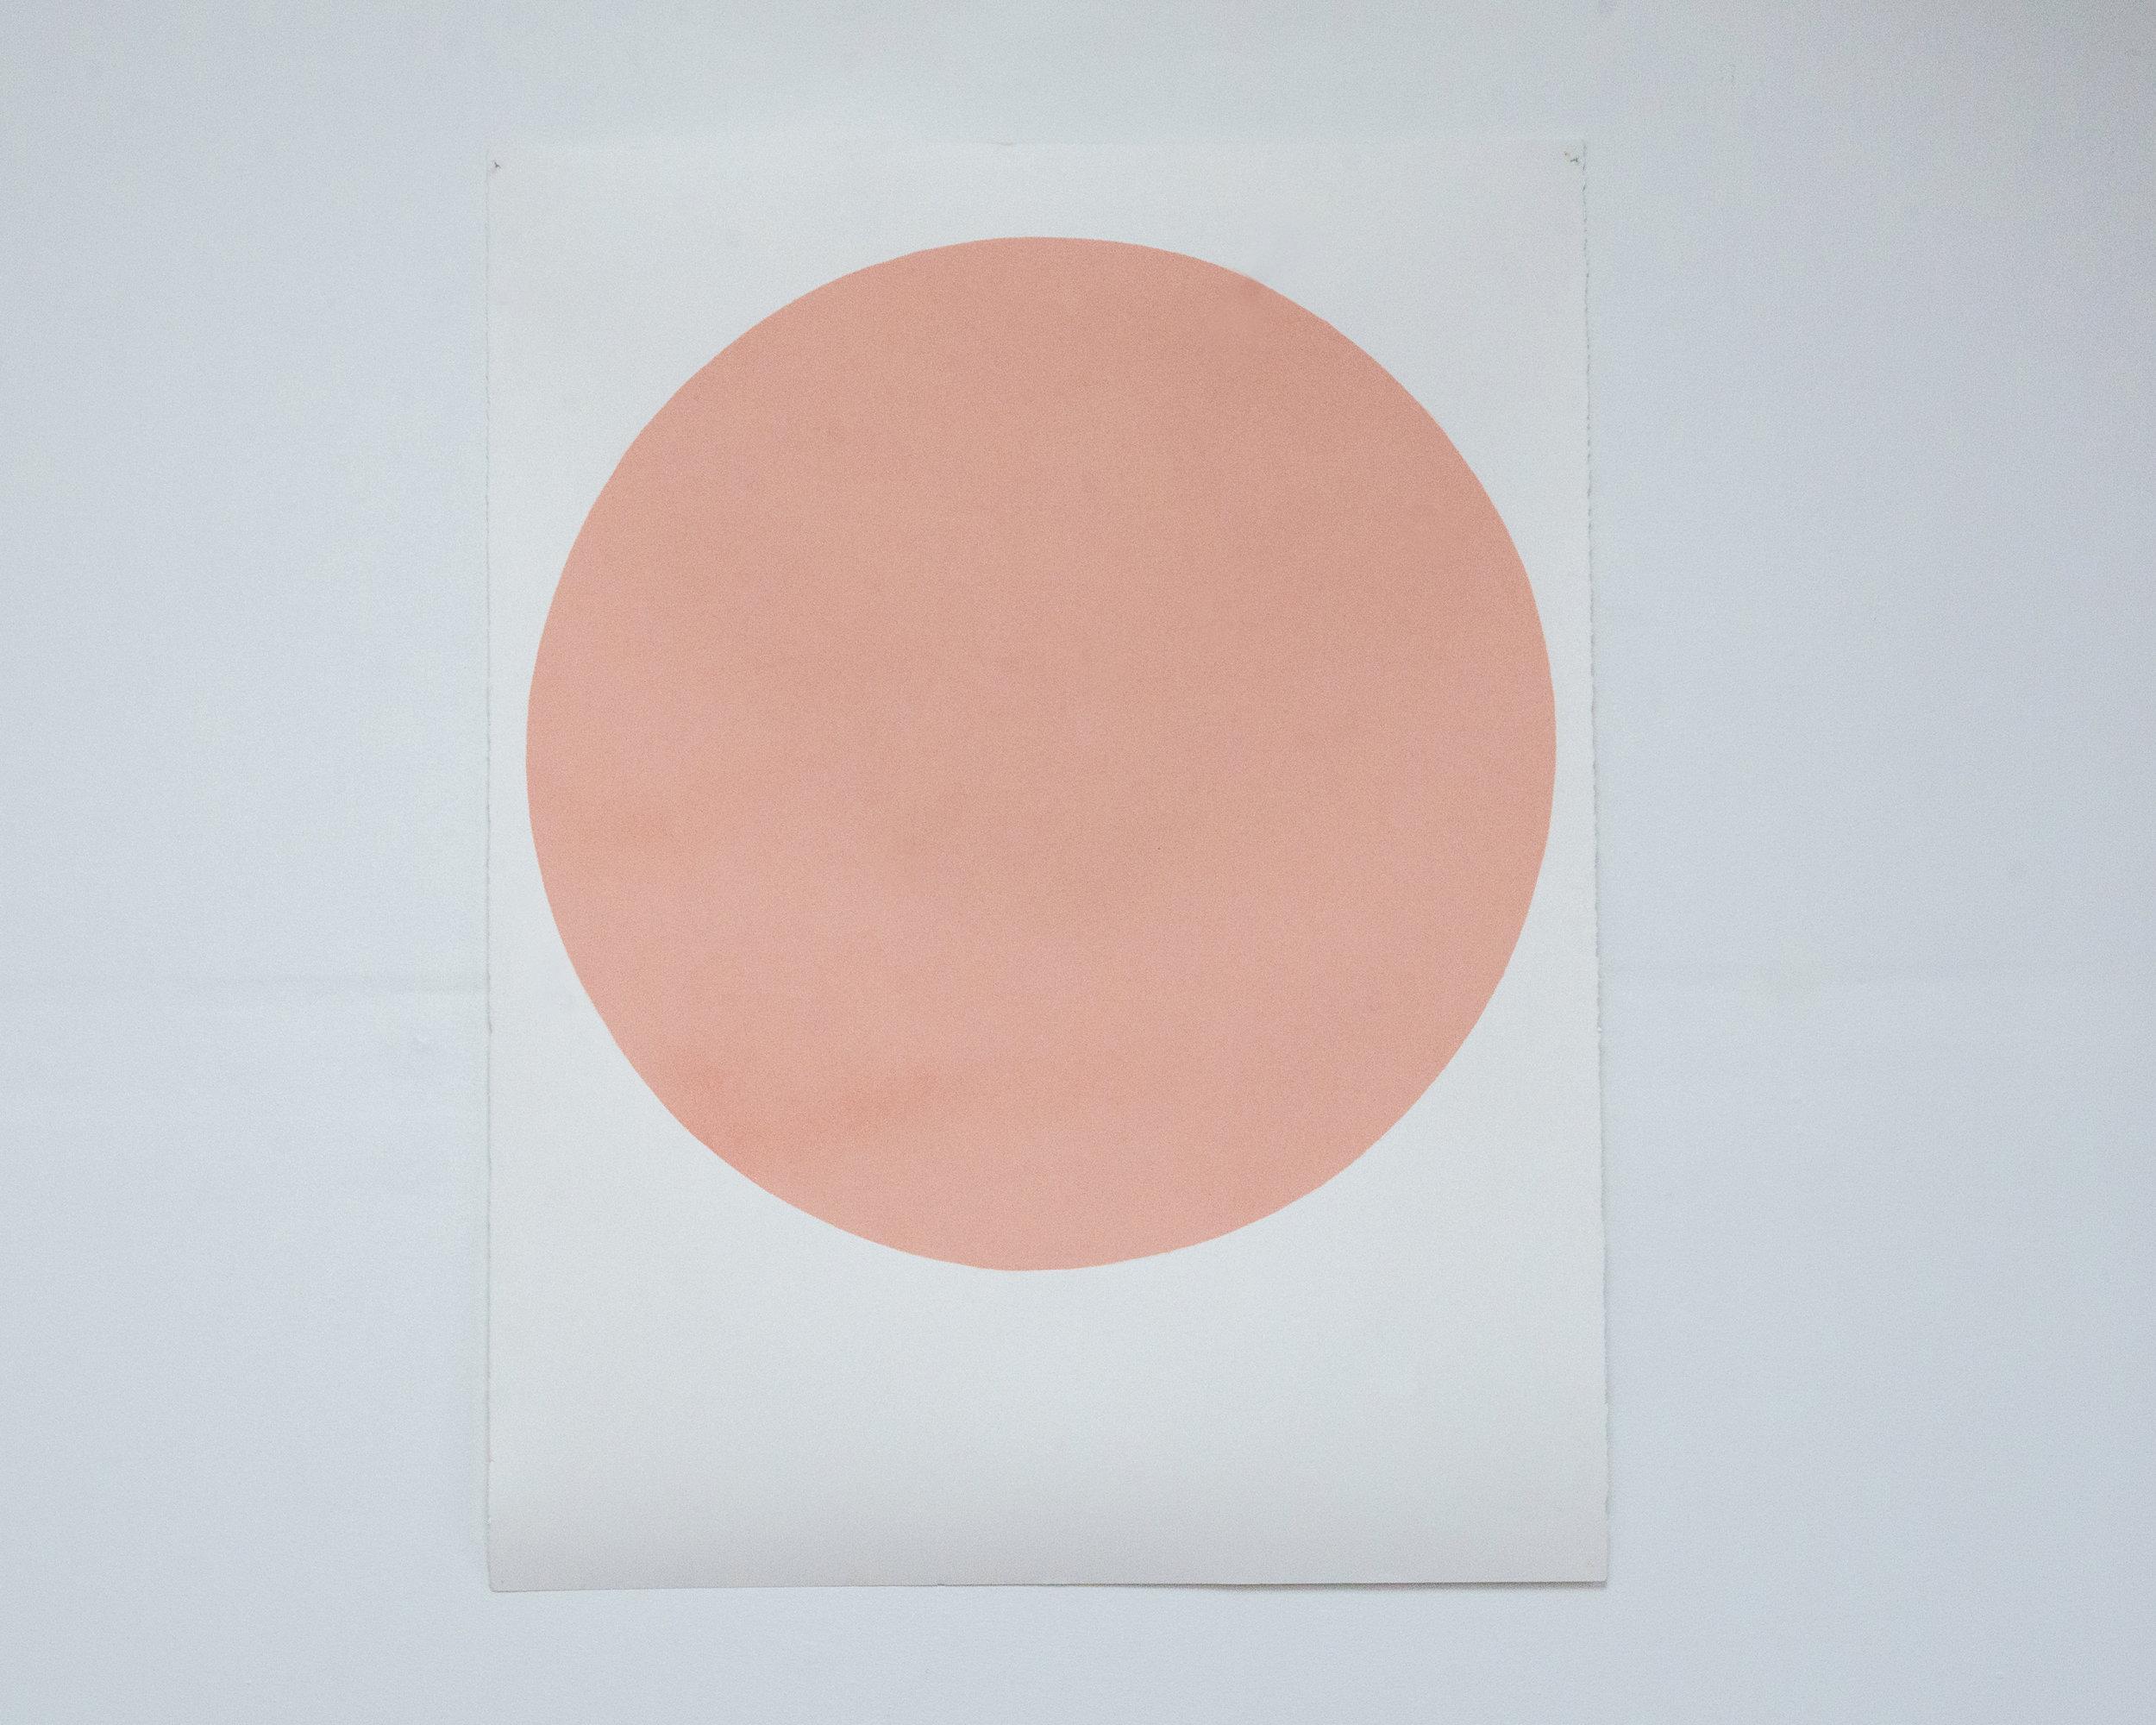 Margrethe Aanestad,  Eternal V , 2019. Pastel pencil on paper. 50x38 inches